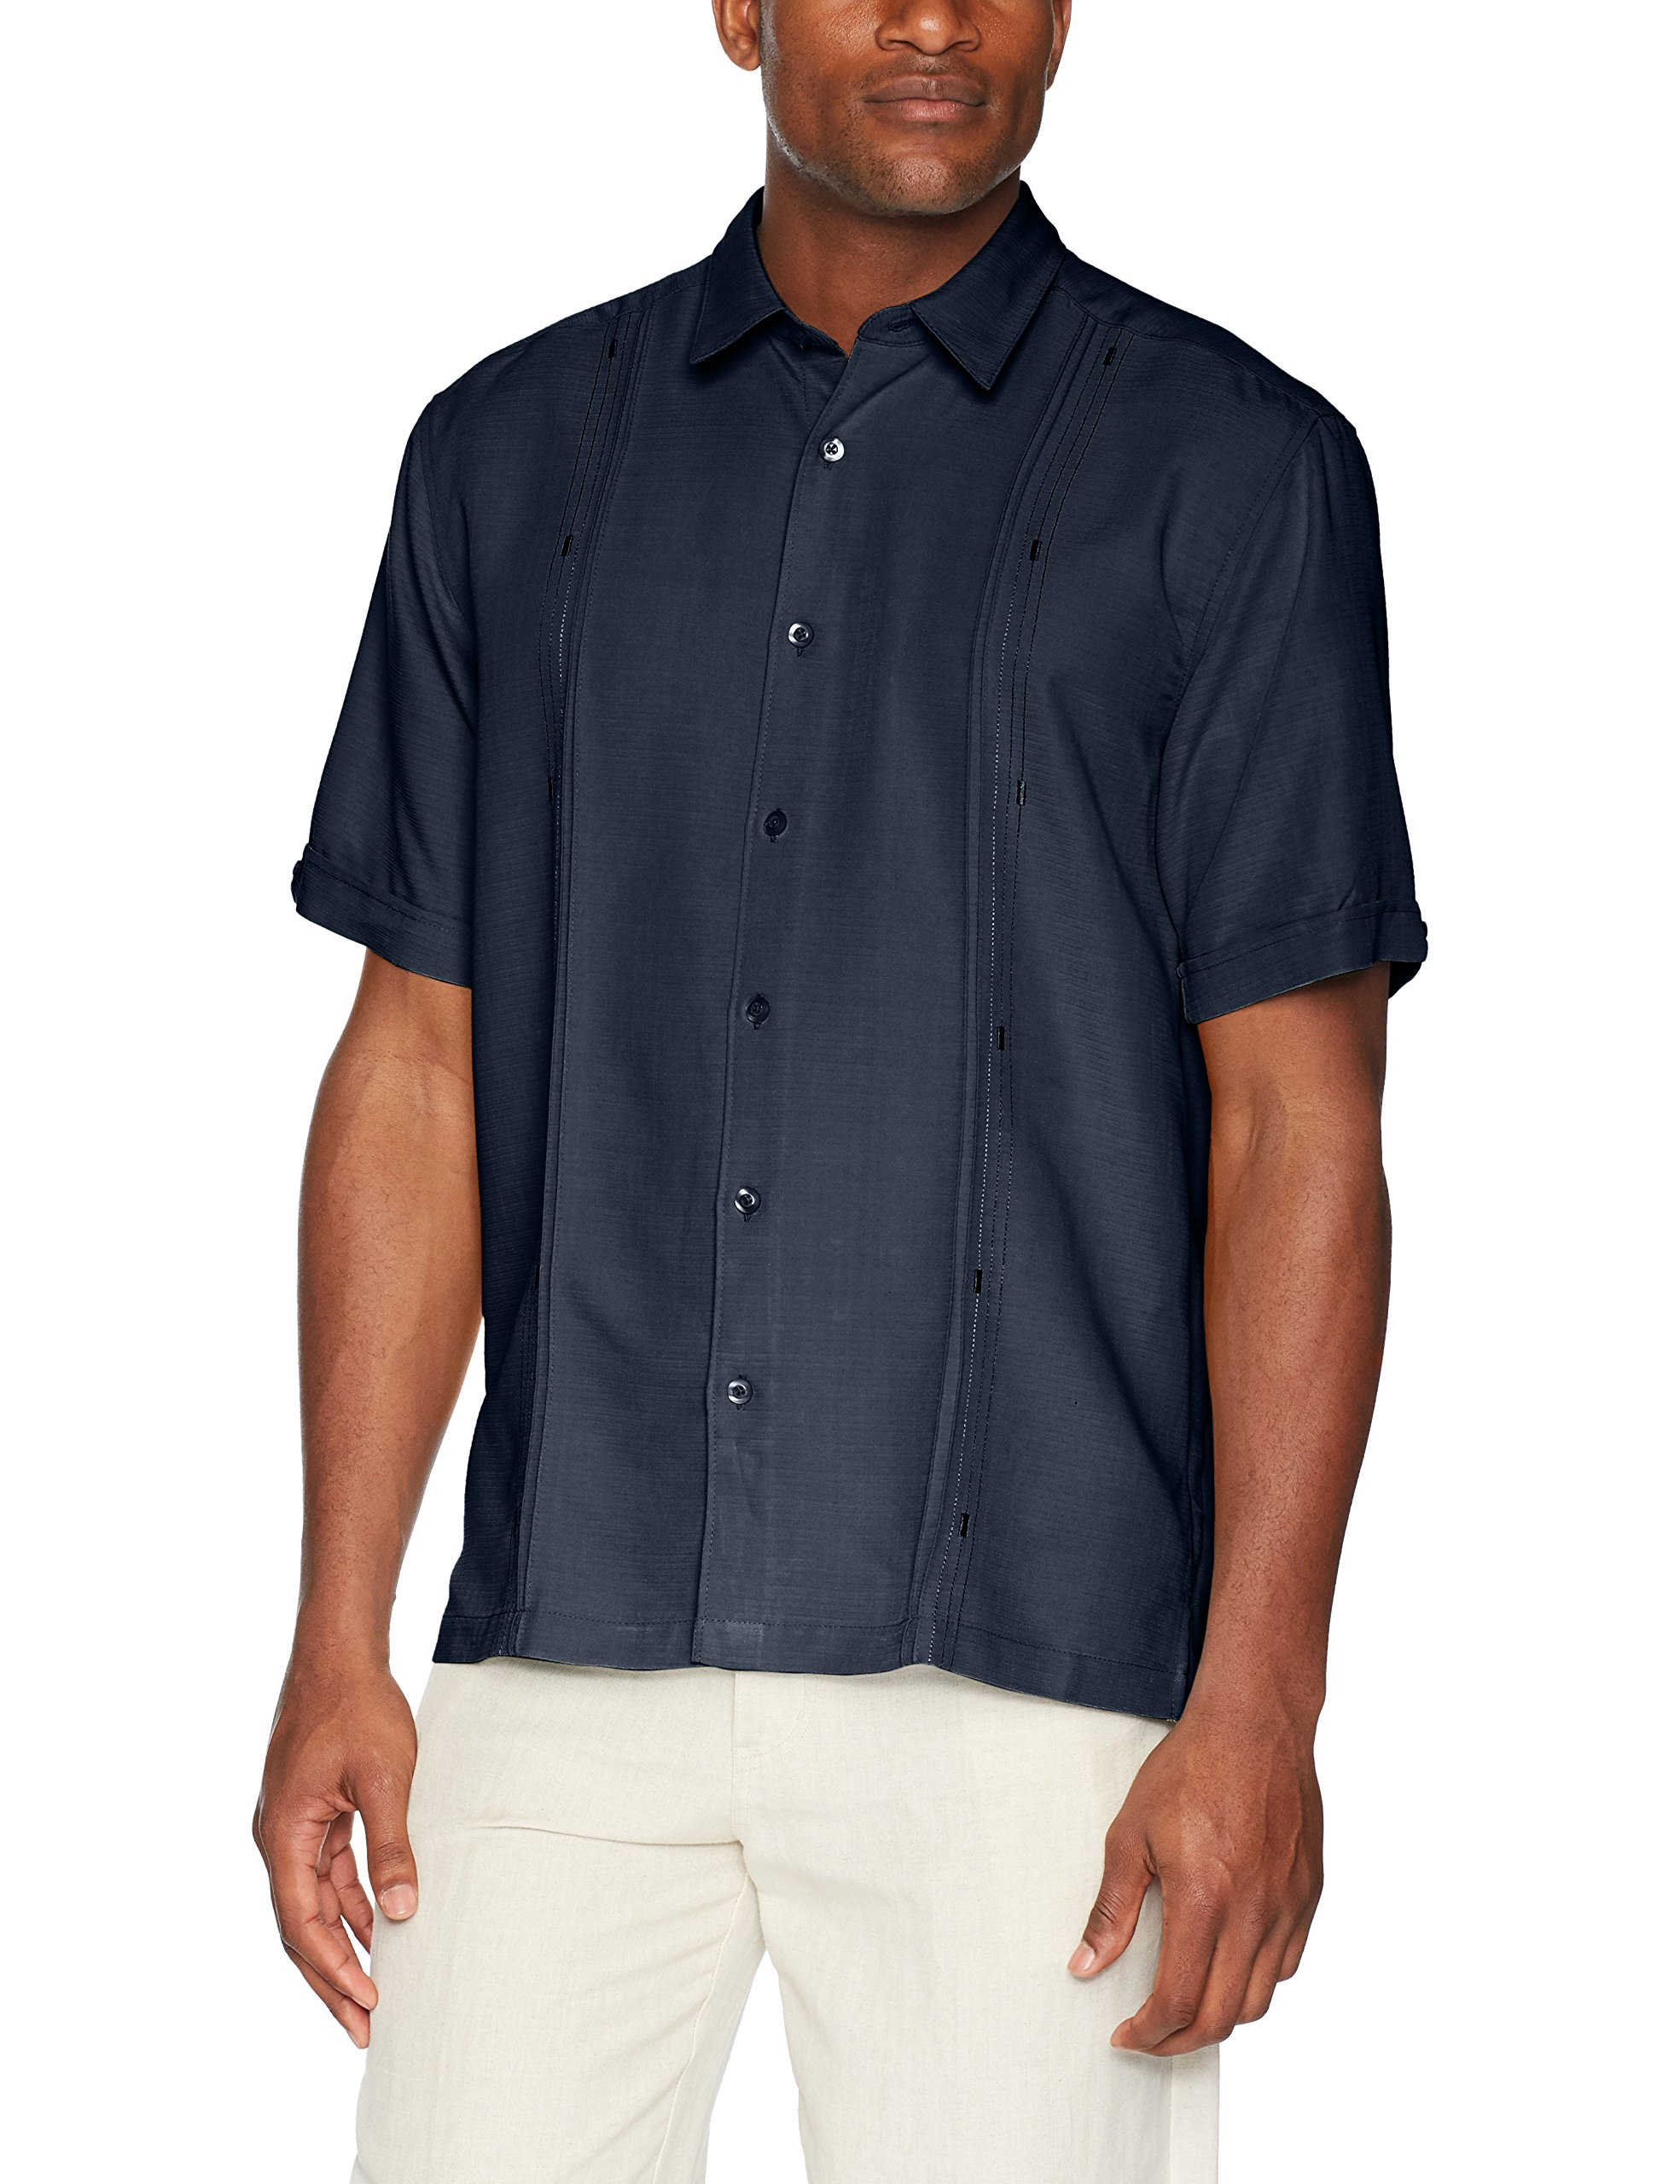 4b3db0da0 Cubavera Men's Big Short Sleeve Cuban Camp Shirt with Contrast Insert  Panels, Navy Blazer with